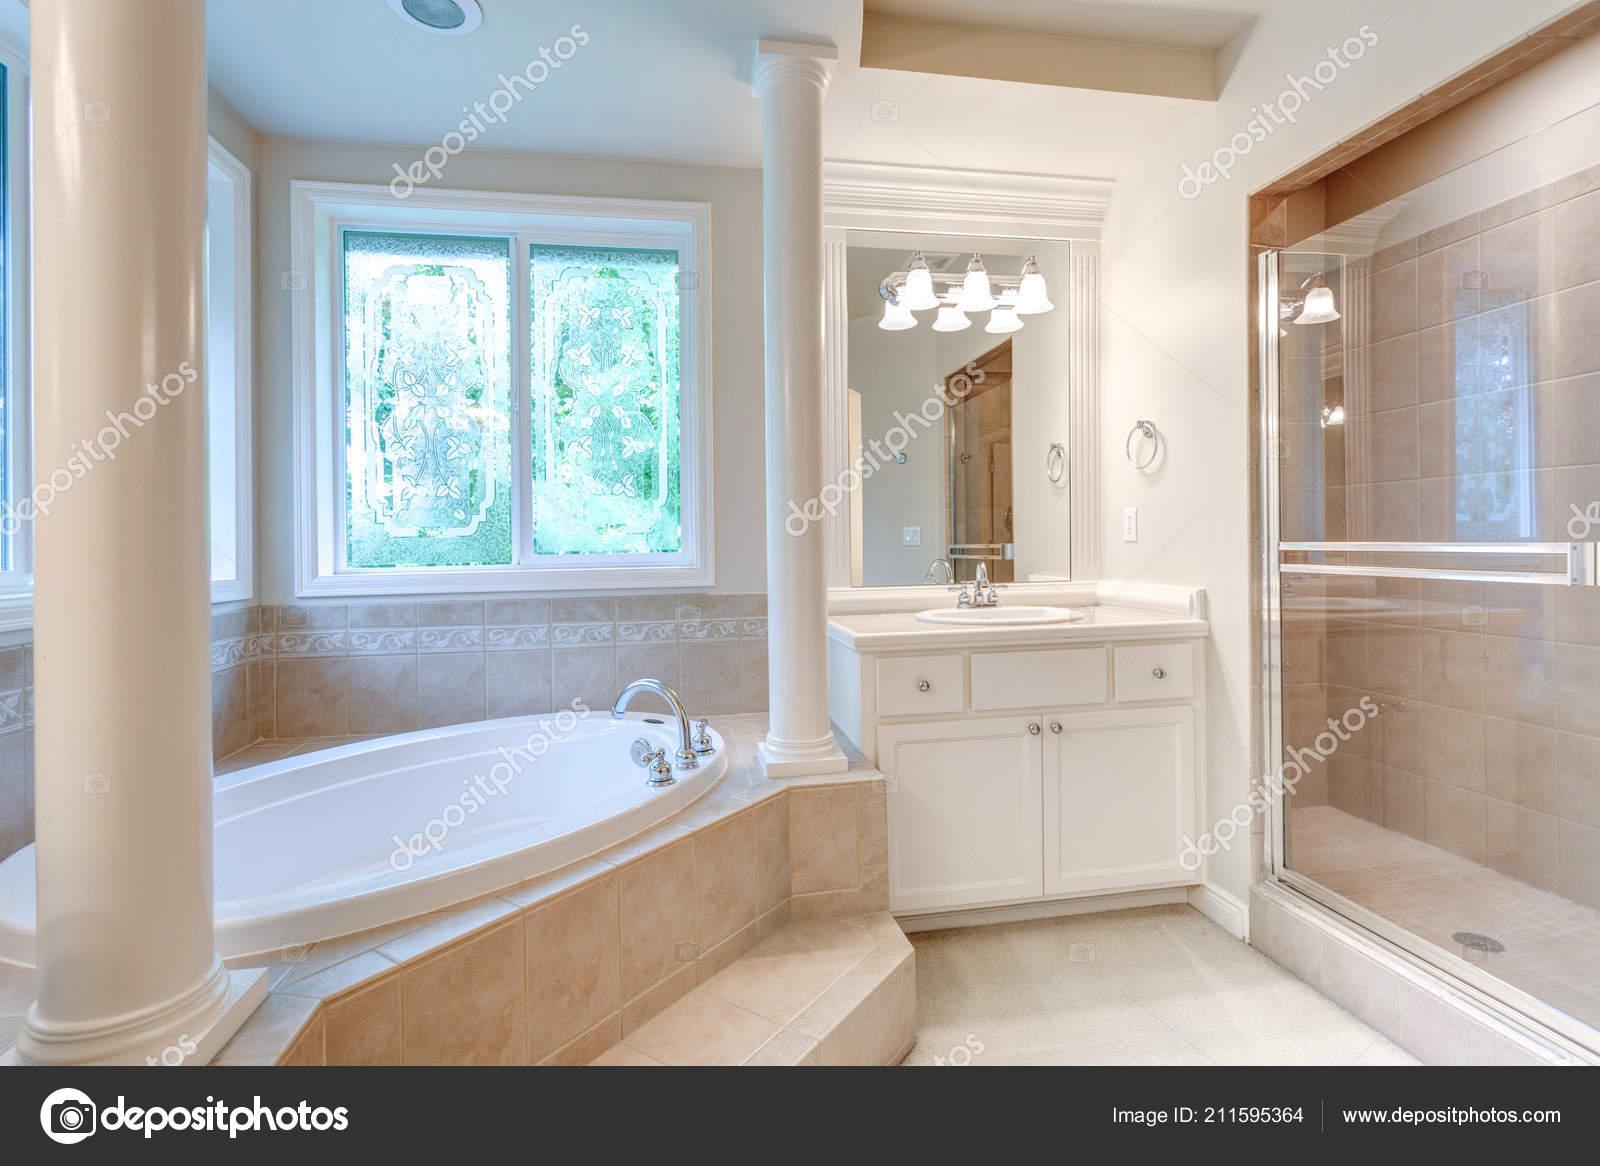 Pictures Bathroom Windows Luxury Master Bathroom Corner Tub Stained Glass Windows White Vanity Stock Photo C Alabn 211595364